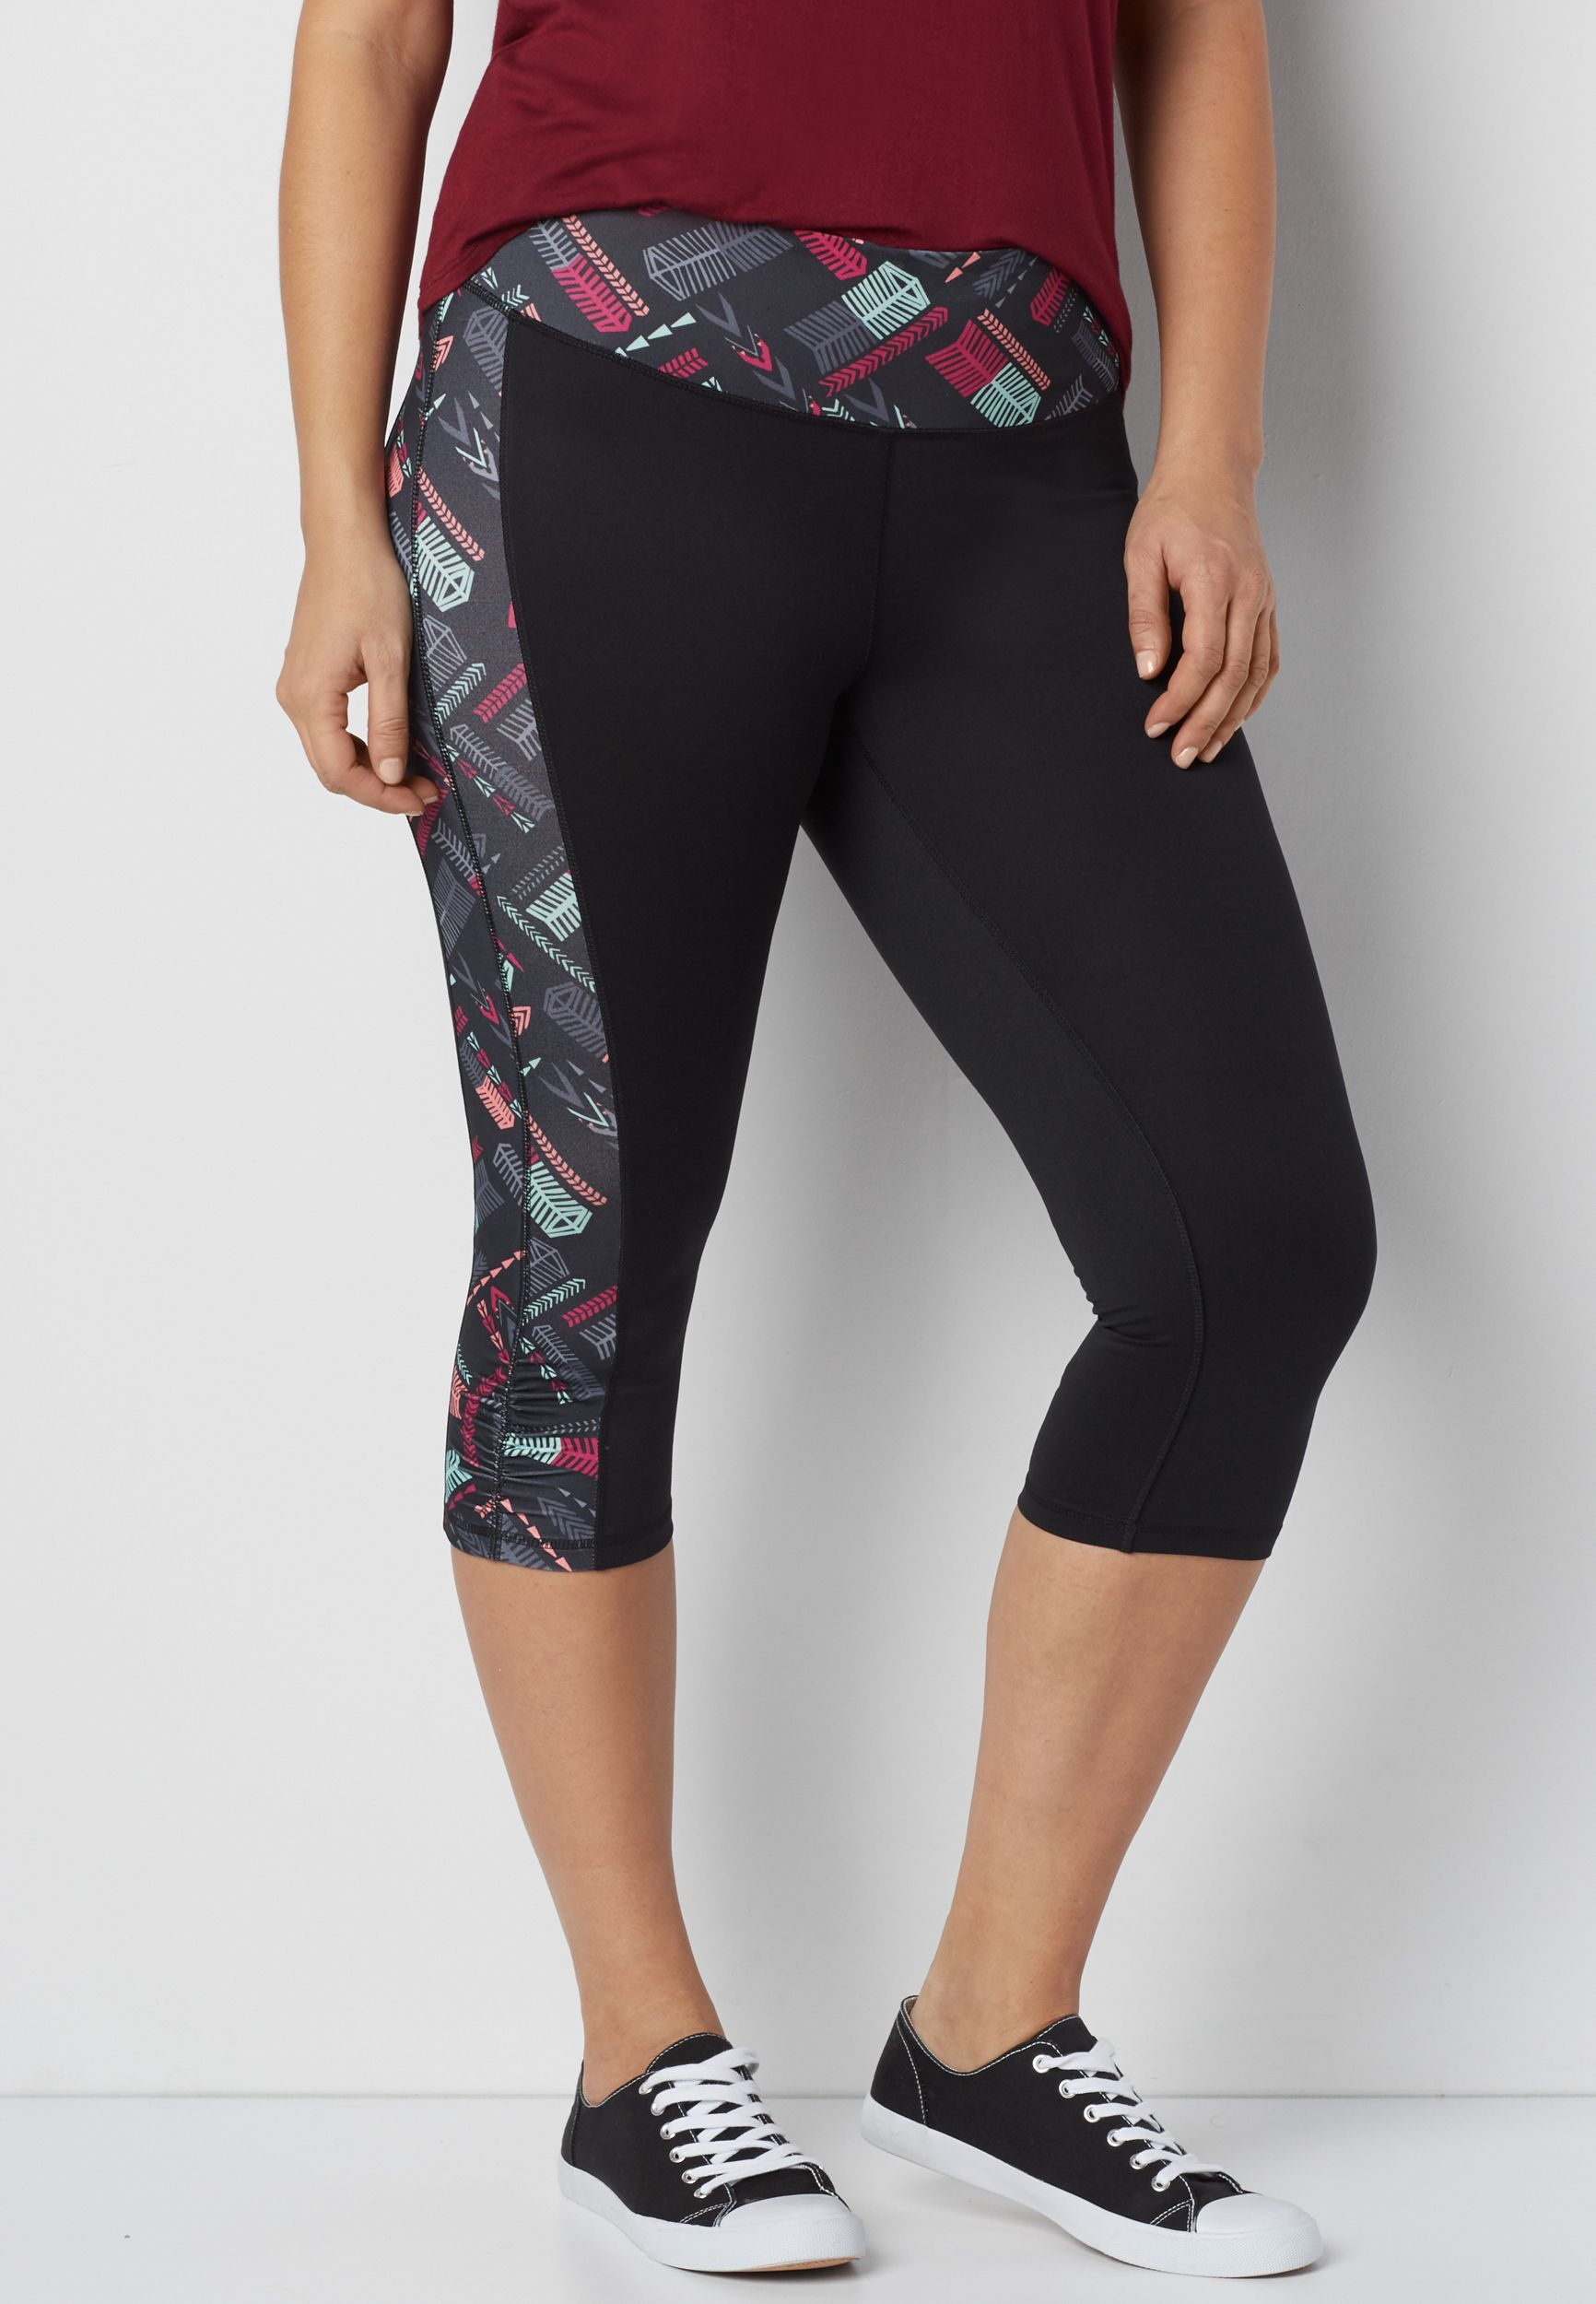 Plus Size Patterned Leggings Simple Inspiration Ideas